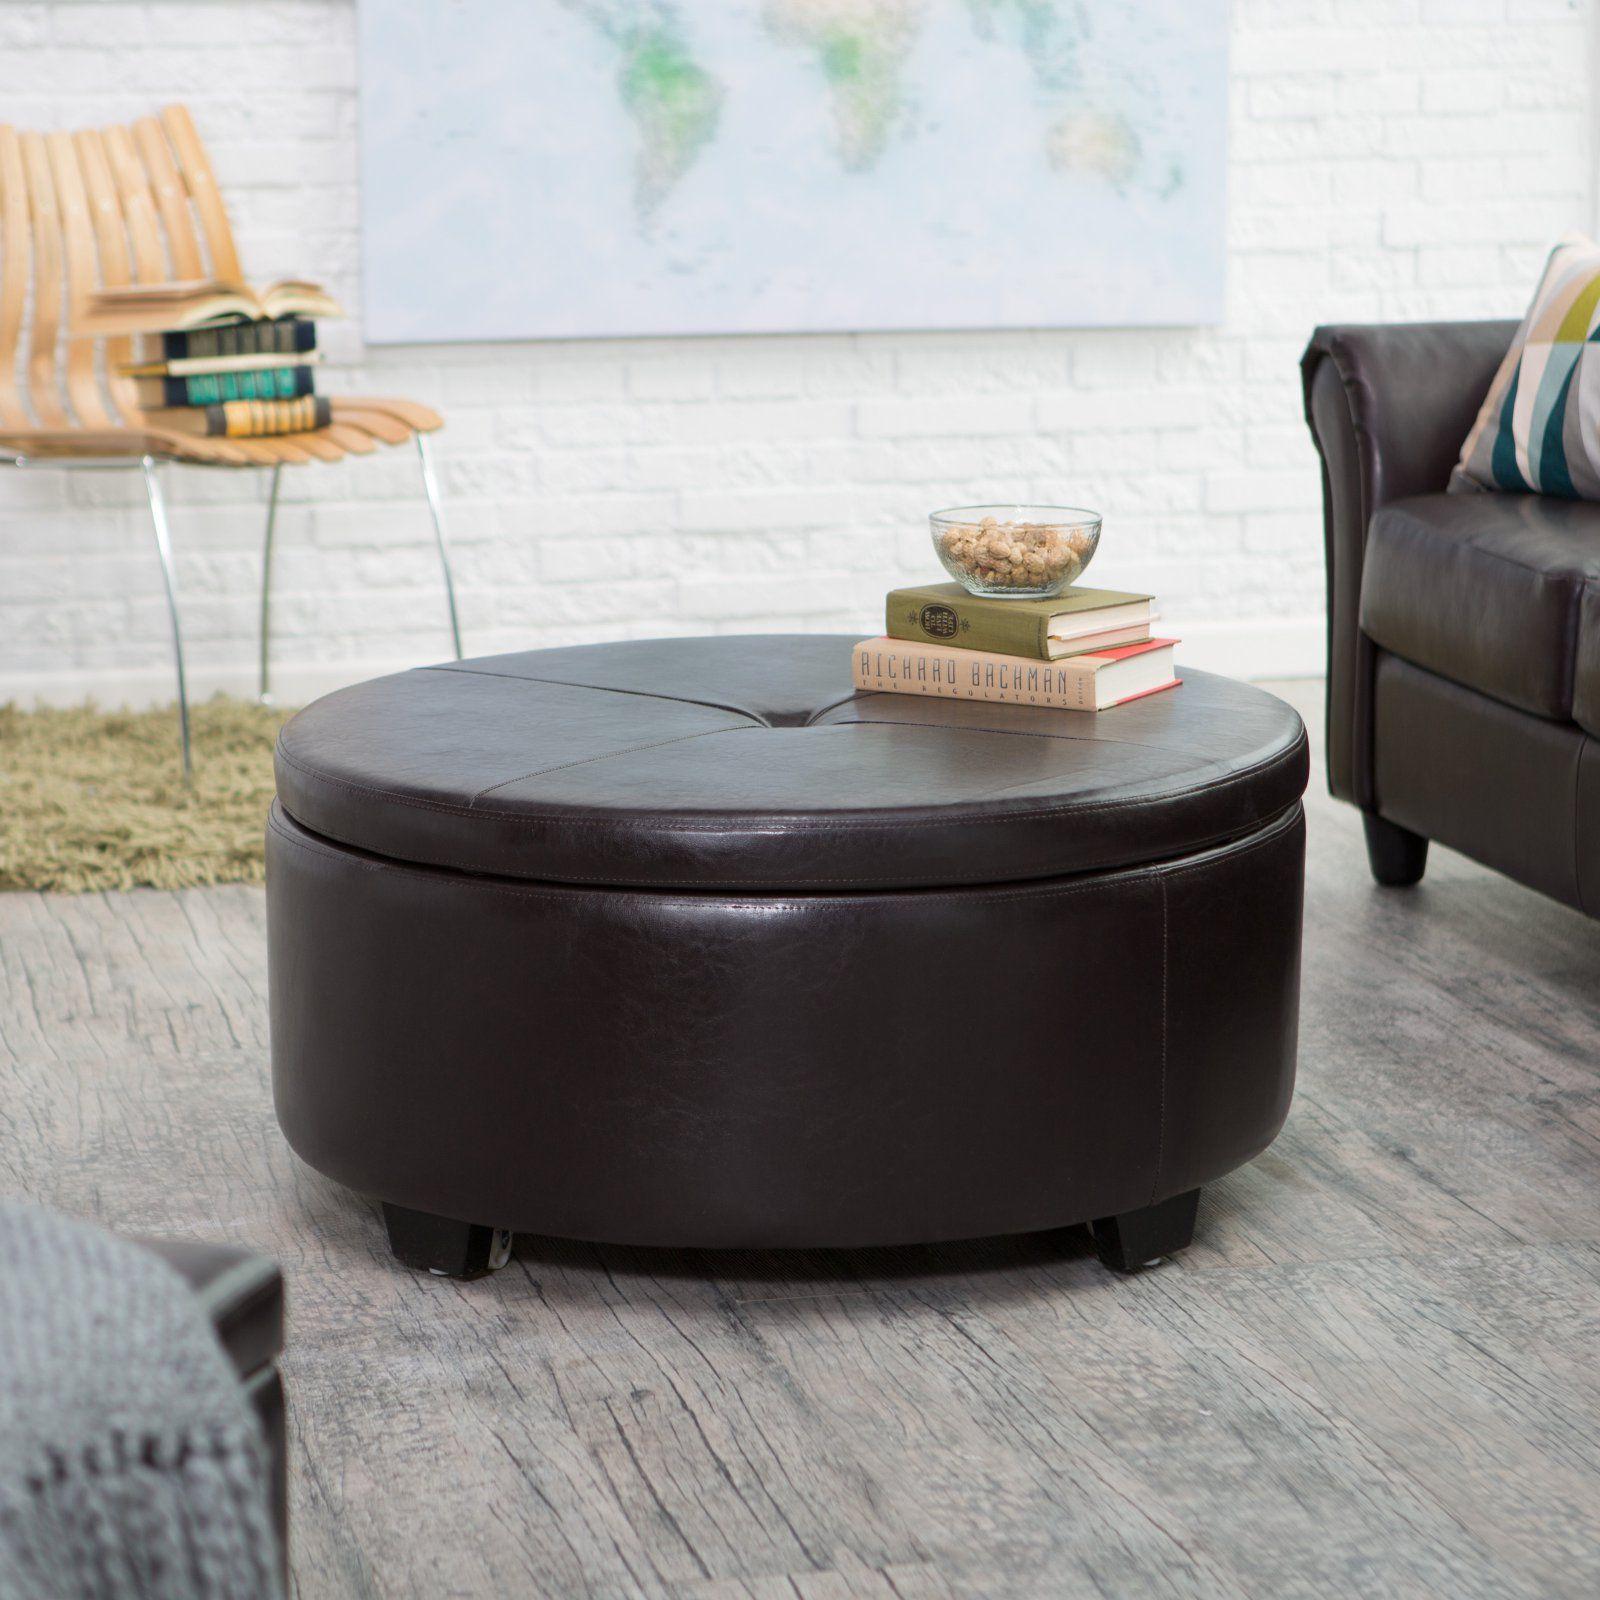 Free 2 Day Shipping Buy Belham Living Corbett Round Coffee Table Storage Storage Ottoman Coffee Table Leather Ottoman Coffee Table Round Ottoman Coffee Table [ 1600 x 1600 Pixel ]